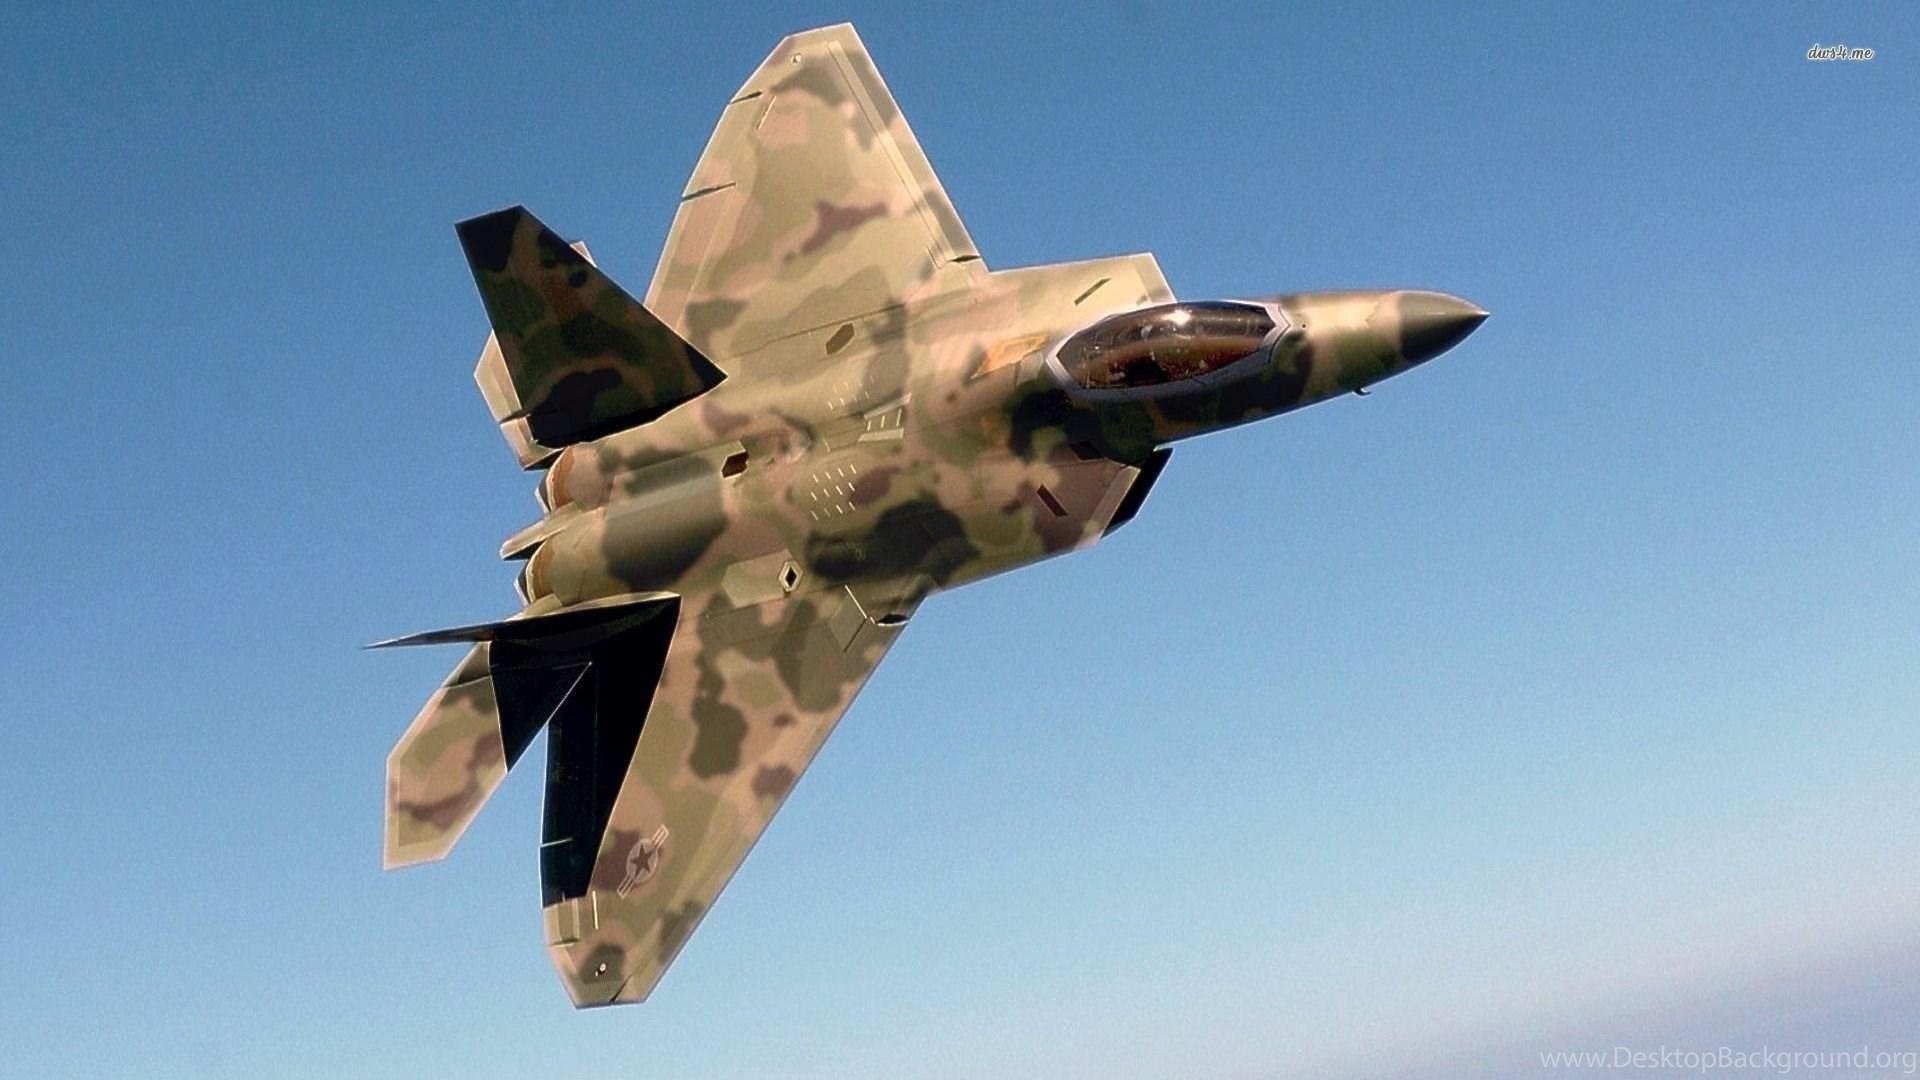 Lockheed Martin F 22 Raptor Wallpapers Aircraft Wallpapers Desktop